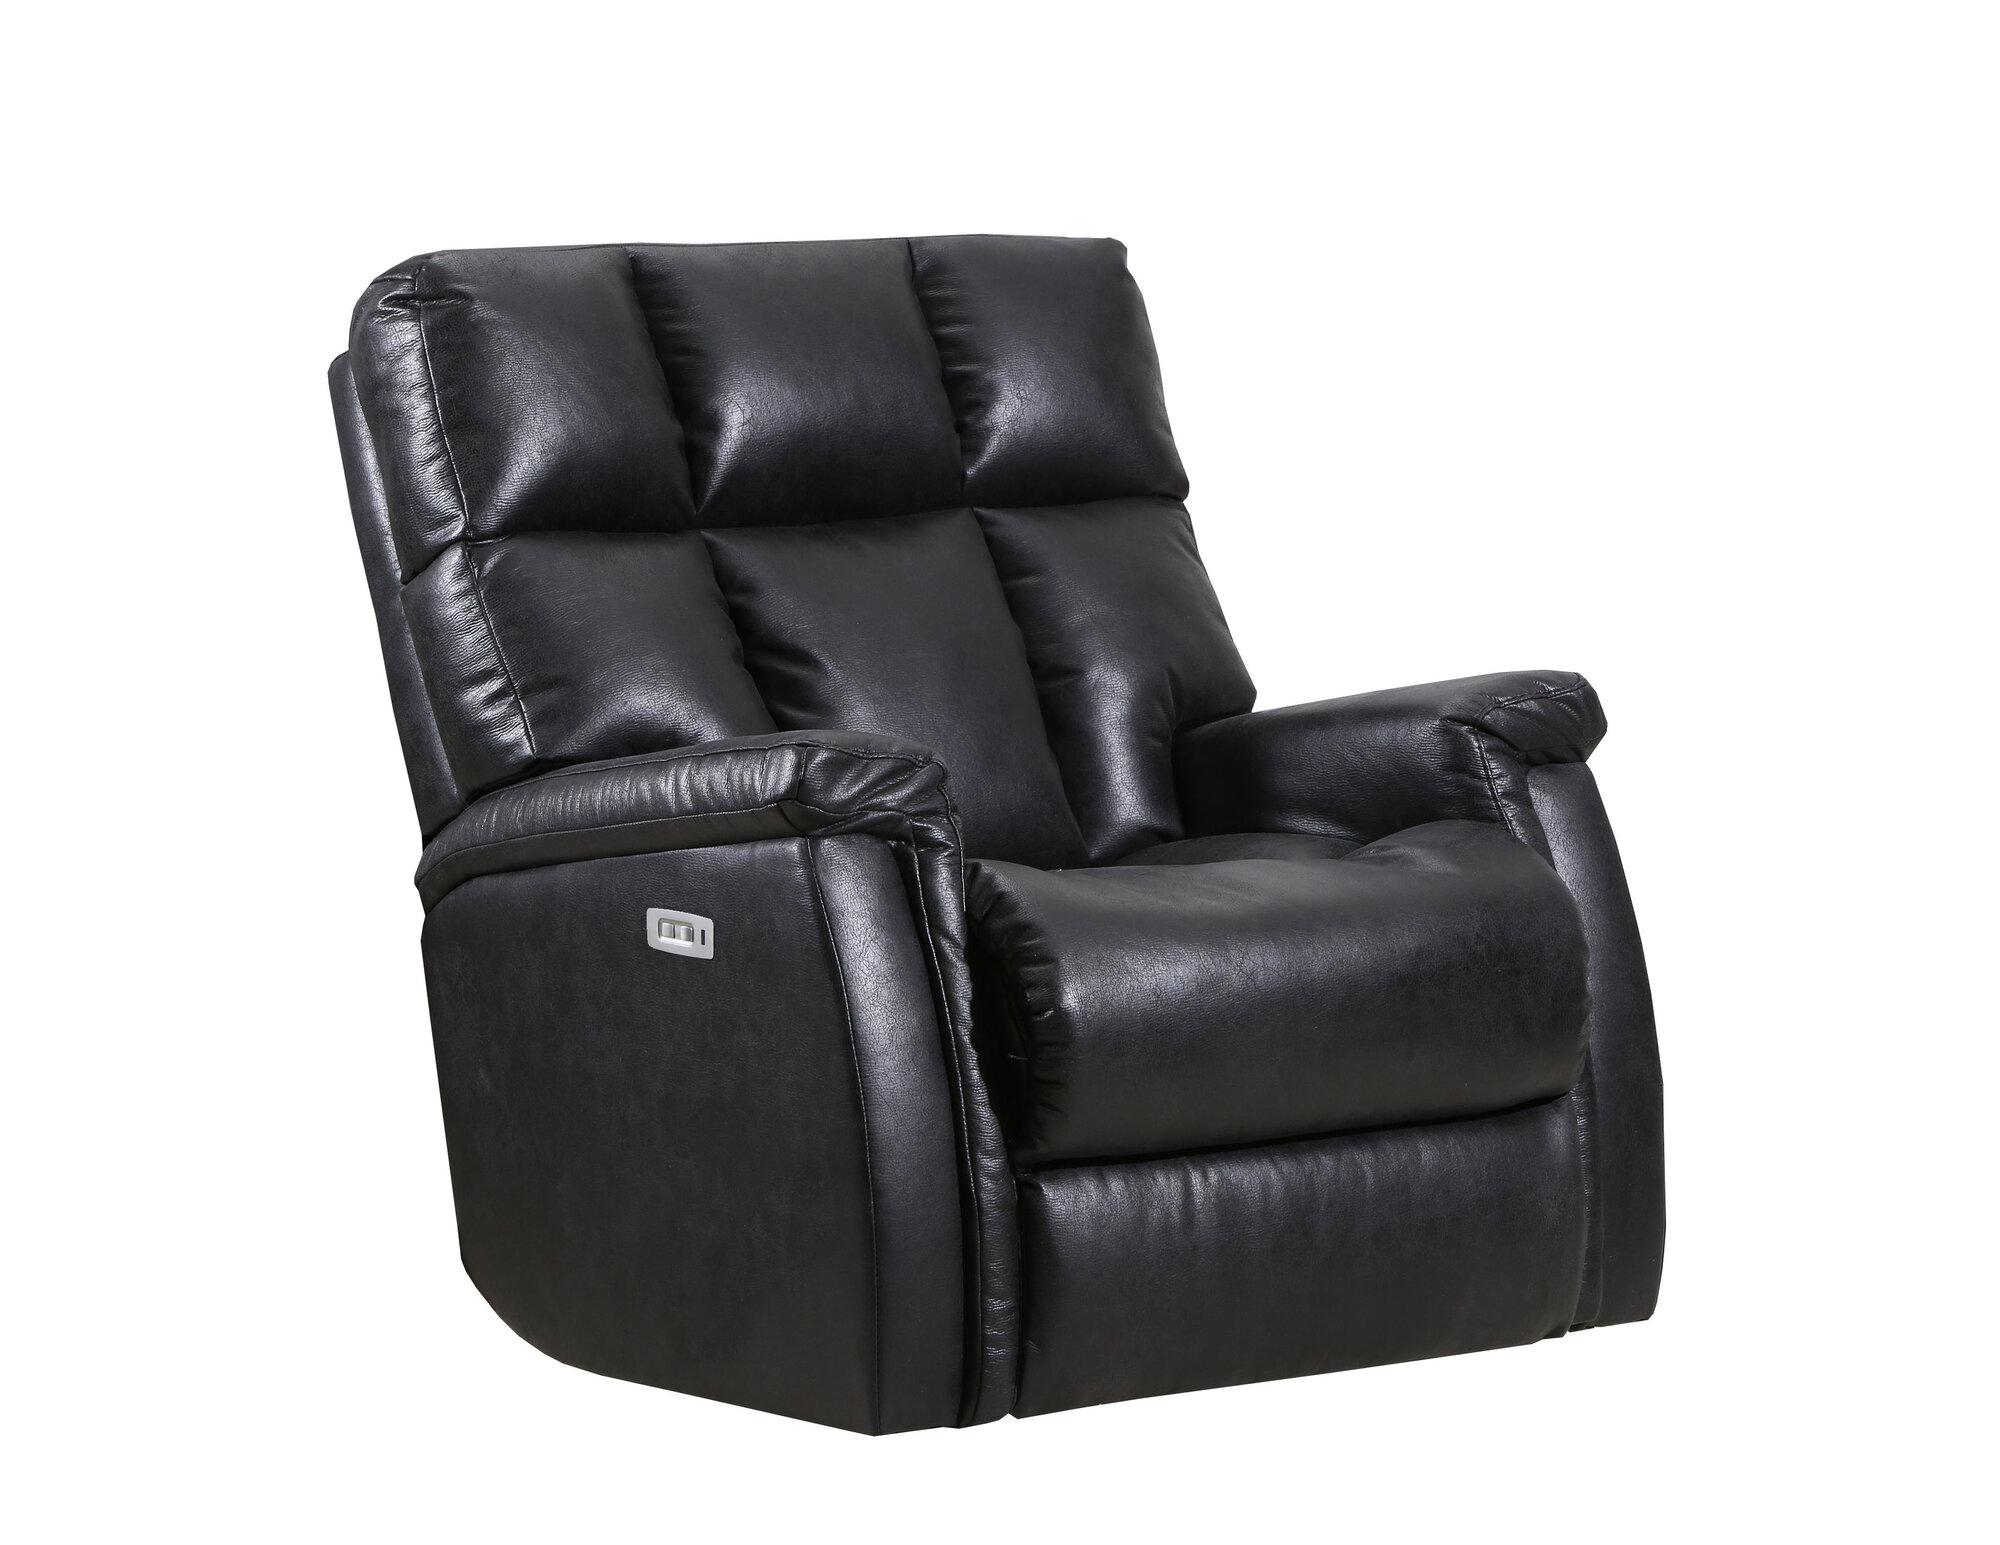 Lane Furniture Alsache Recliner Thumbnail 4